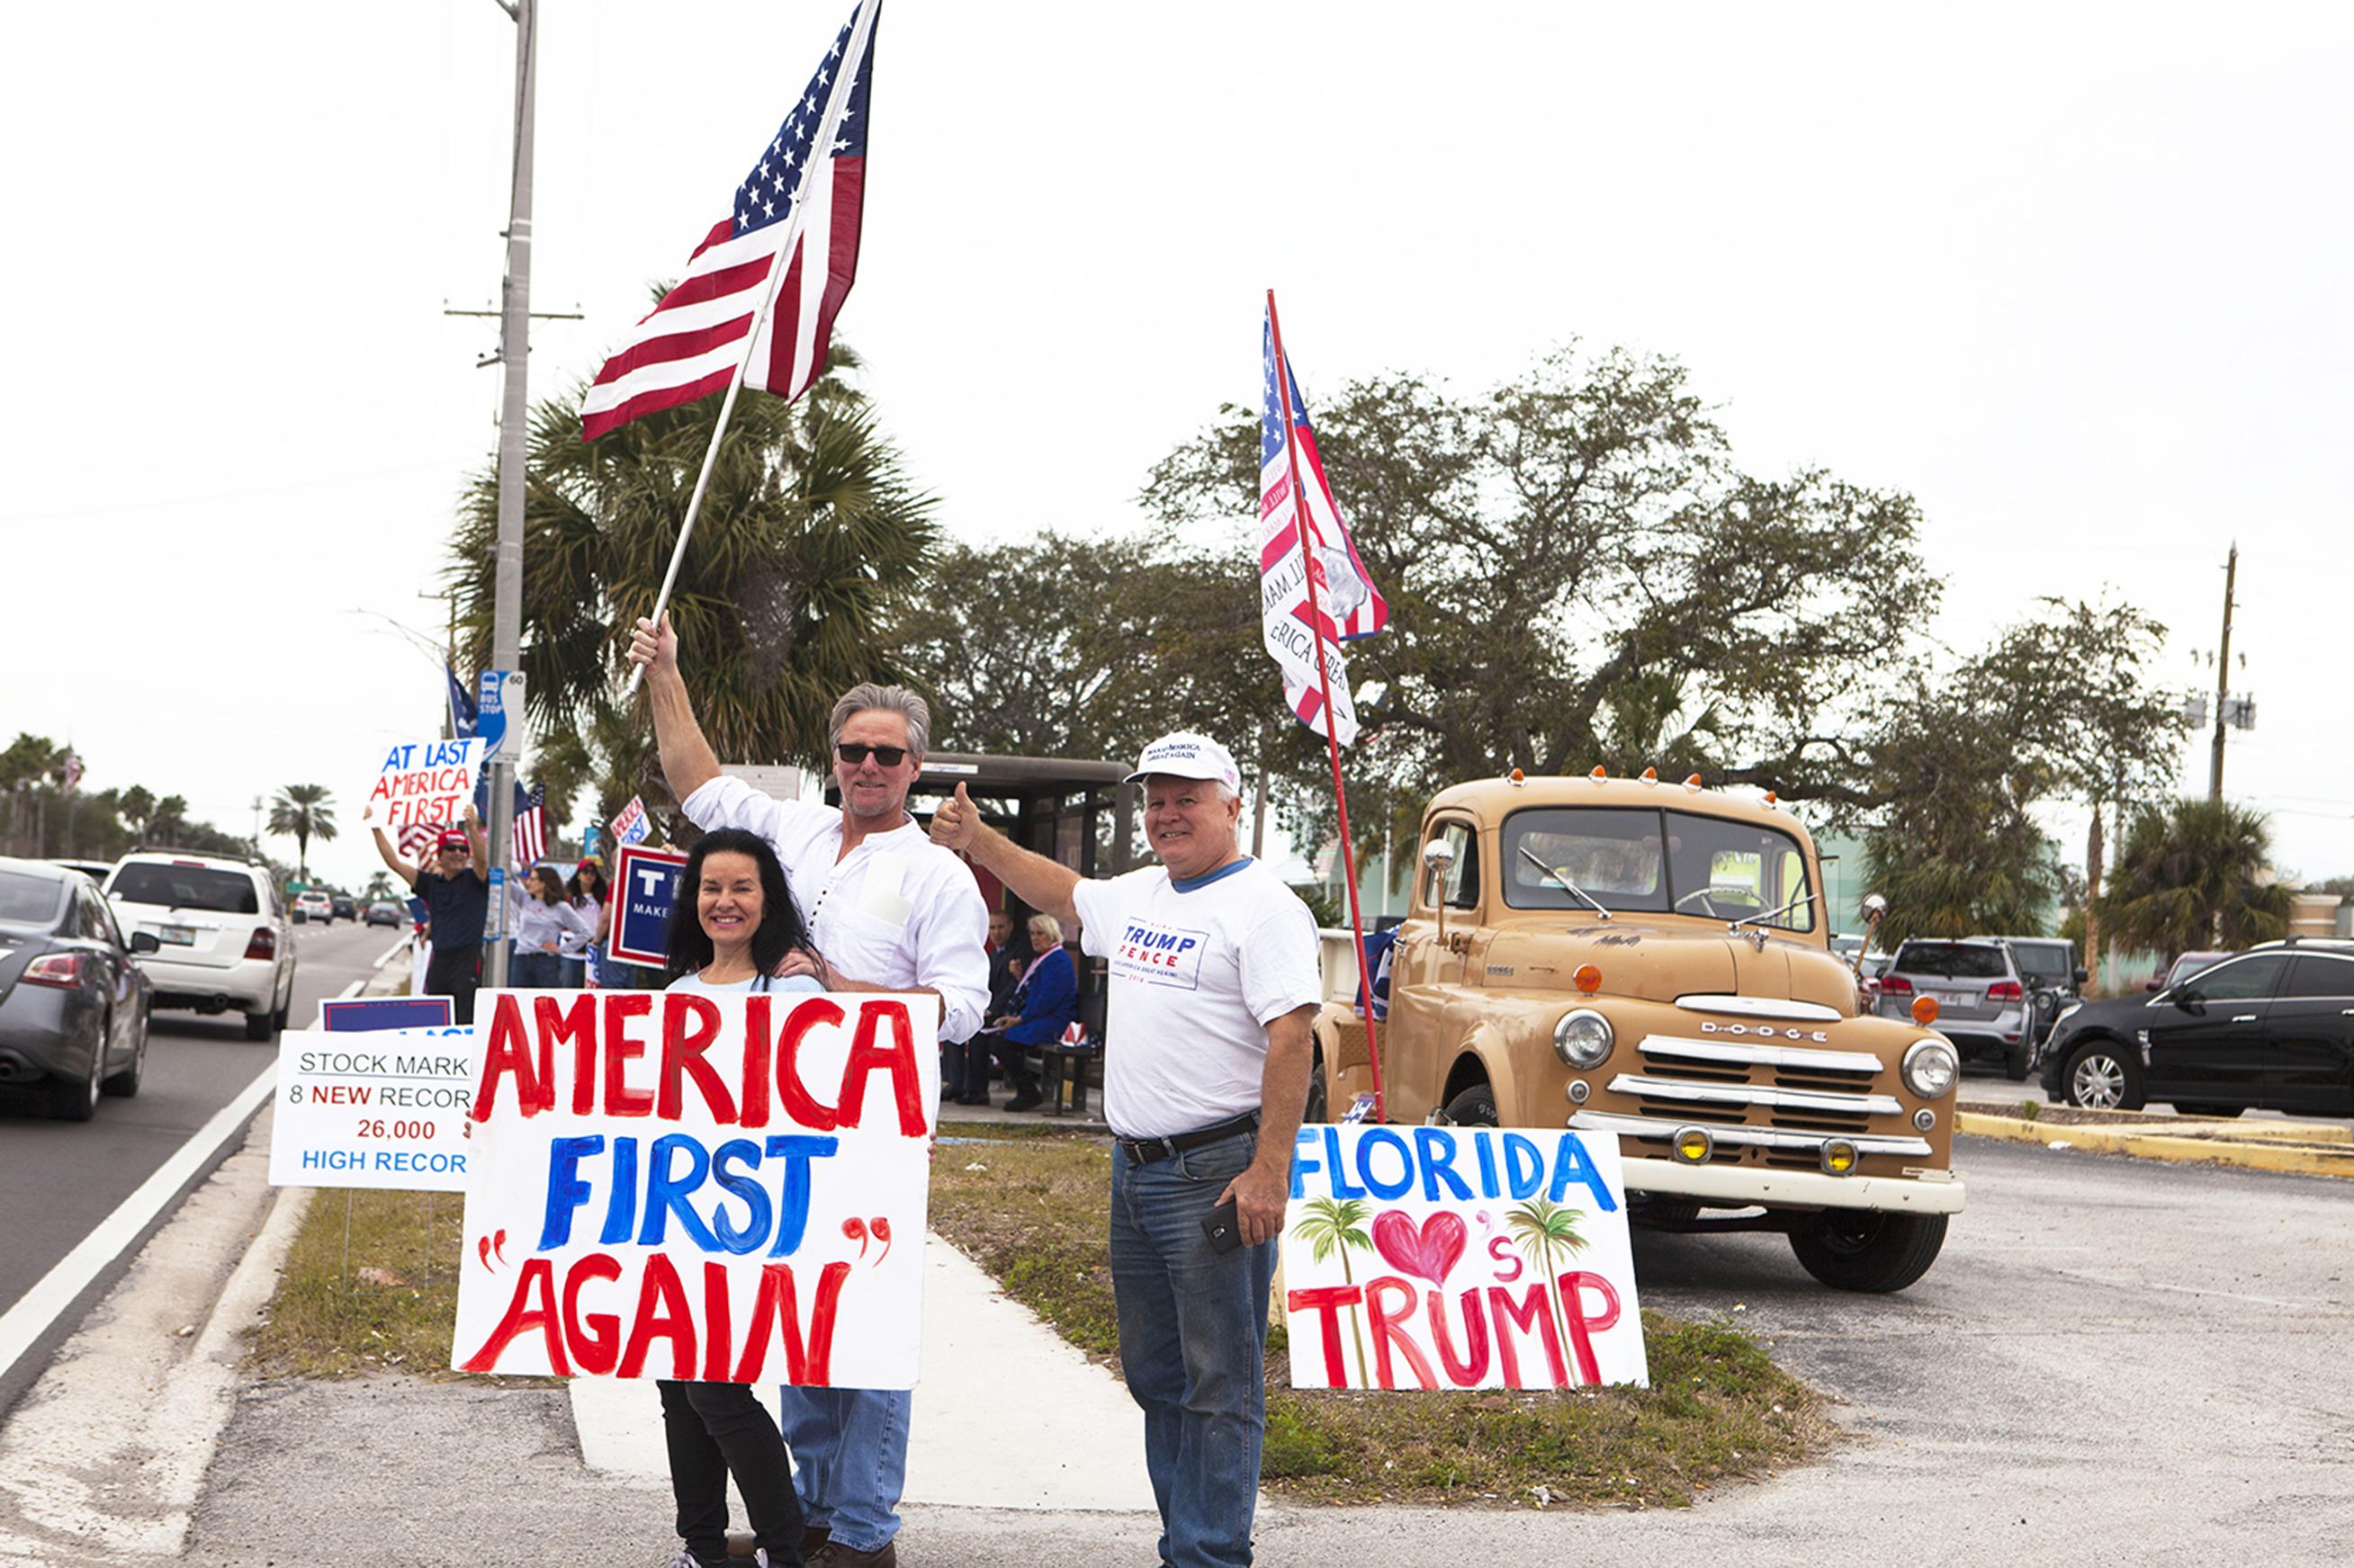 rally-for-donald-trump.jpg